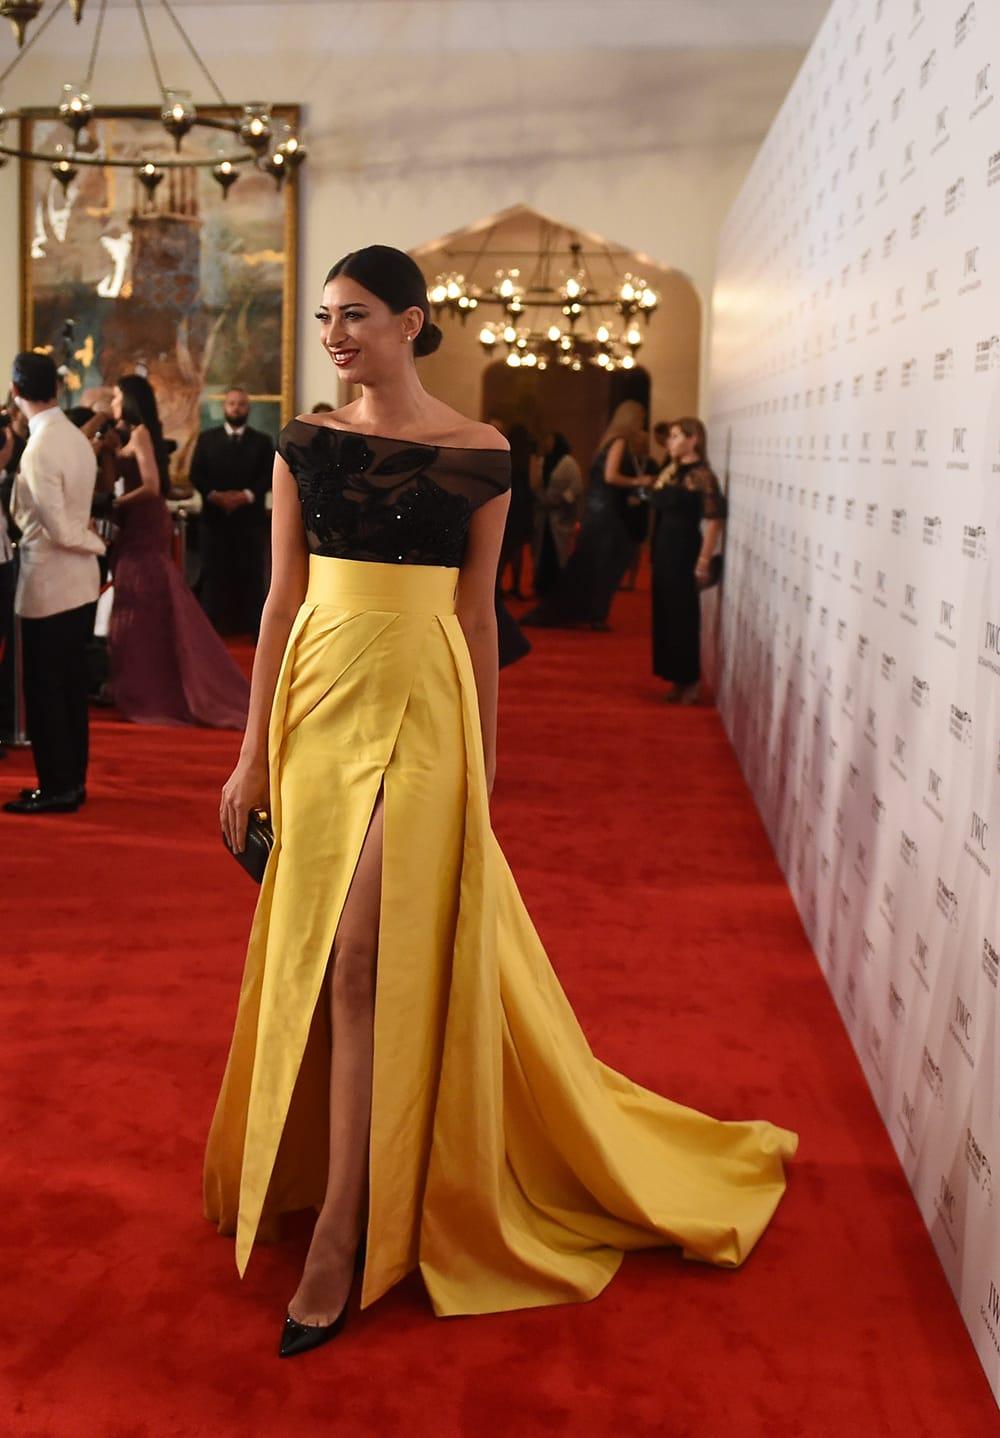 292133d3fd959 فساتين رائعة ارتدتها النجمات في حفل جوائز IWC صوتي للأجمل - Savoir Flair Al  Arabiya